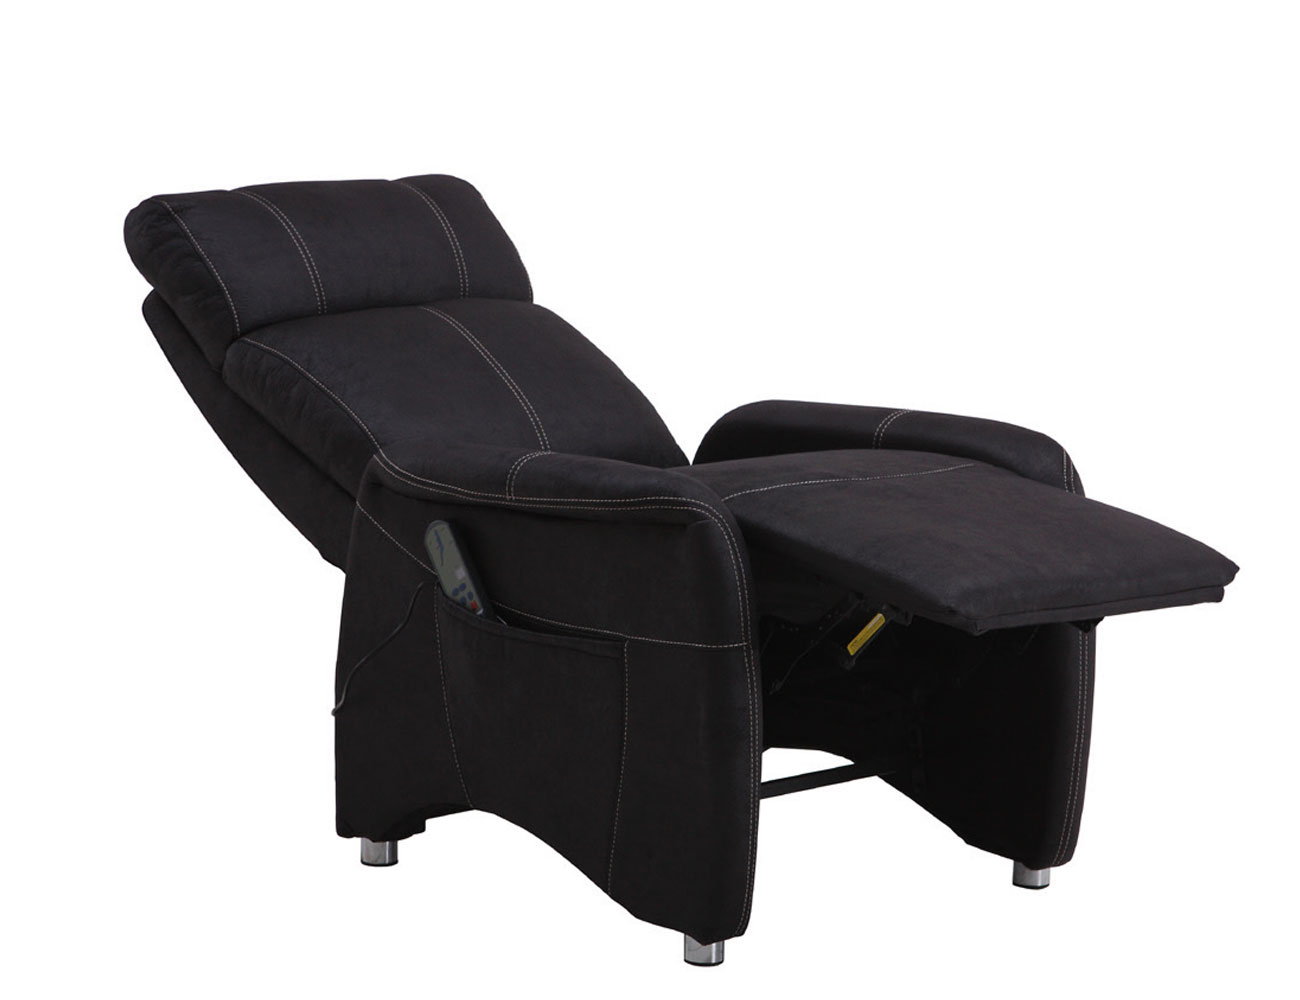 Sillon relax masaje vibracion negro 2